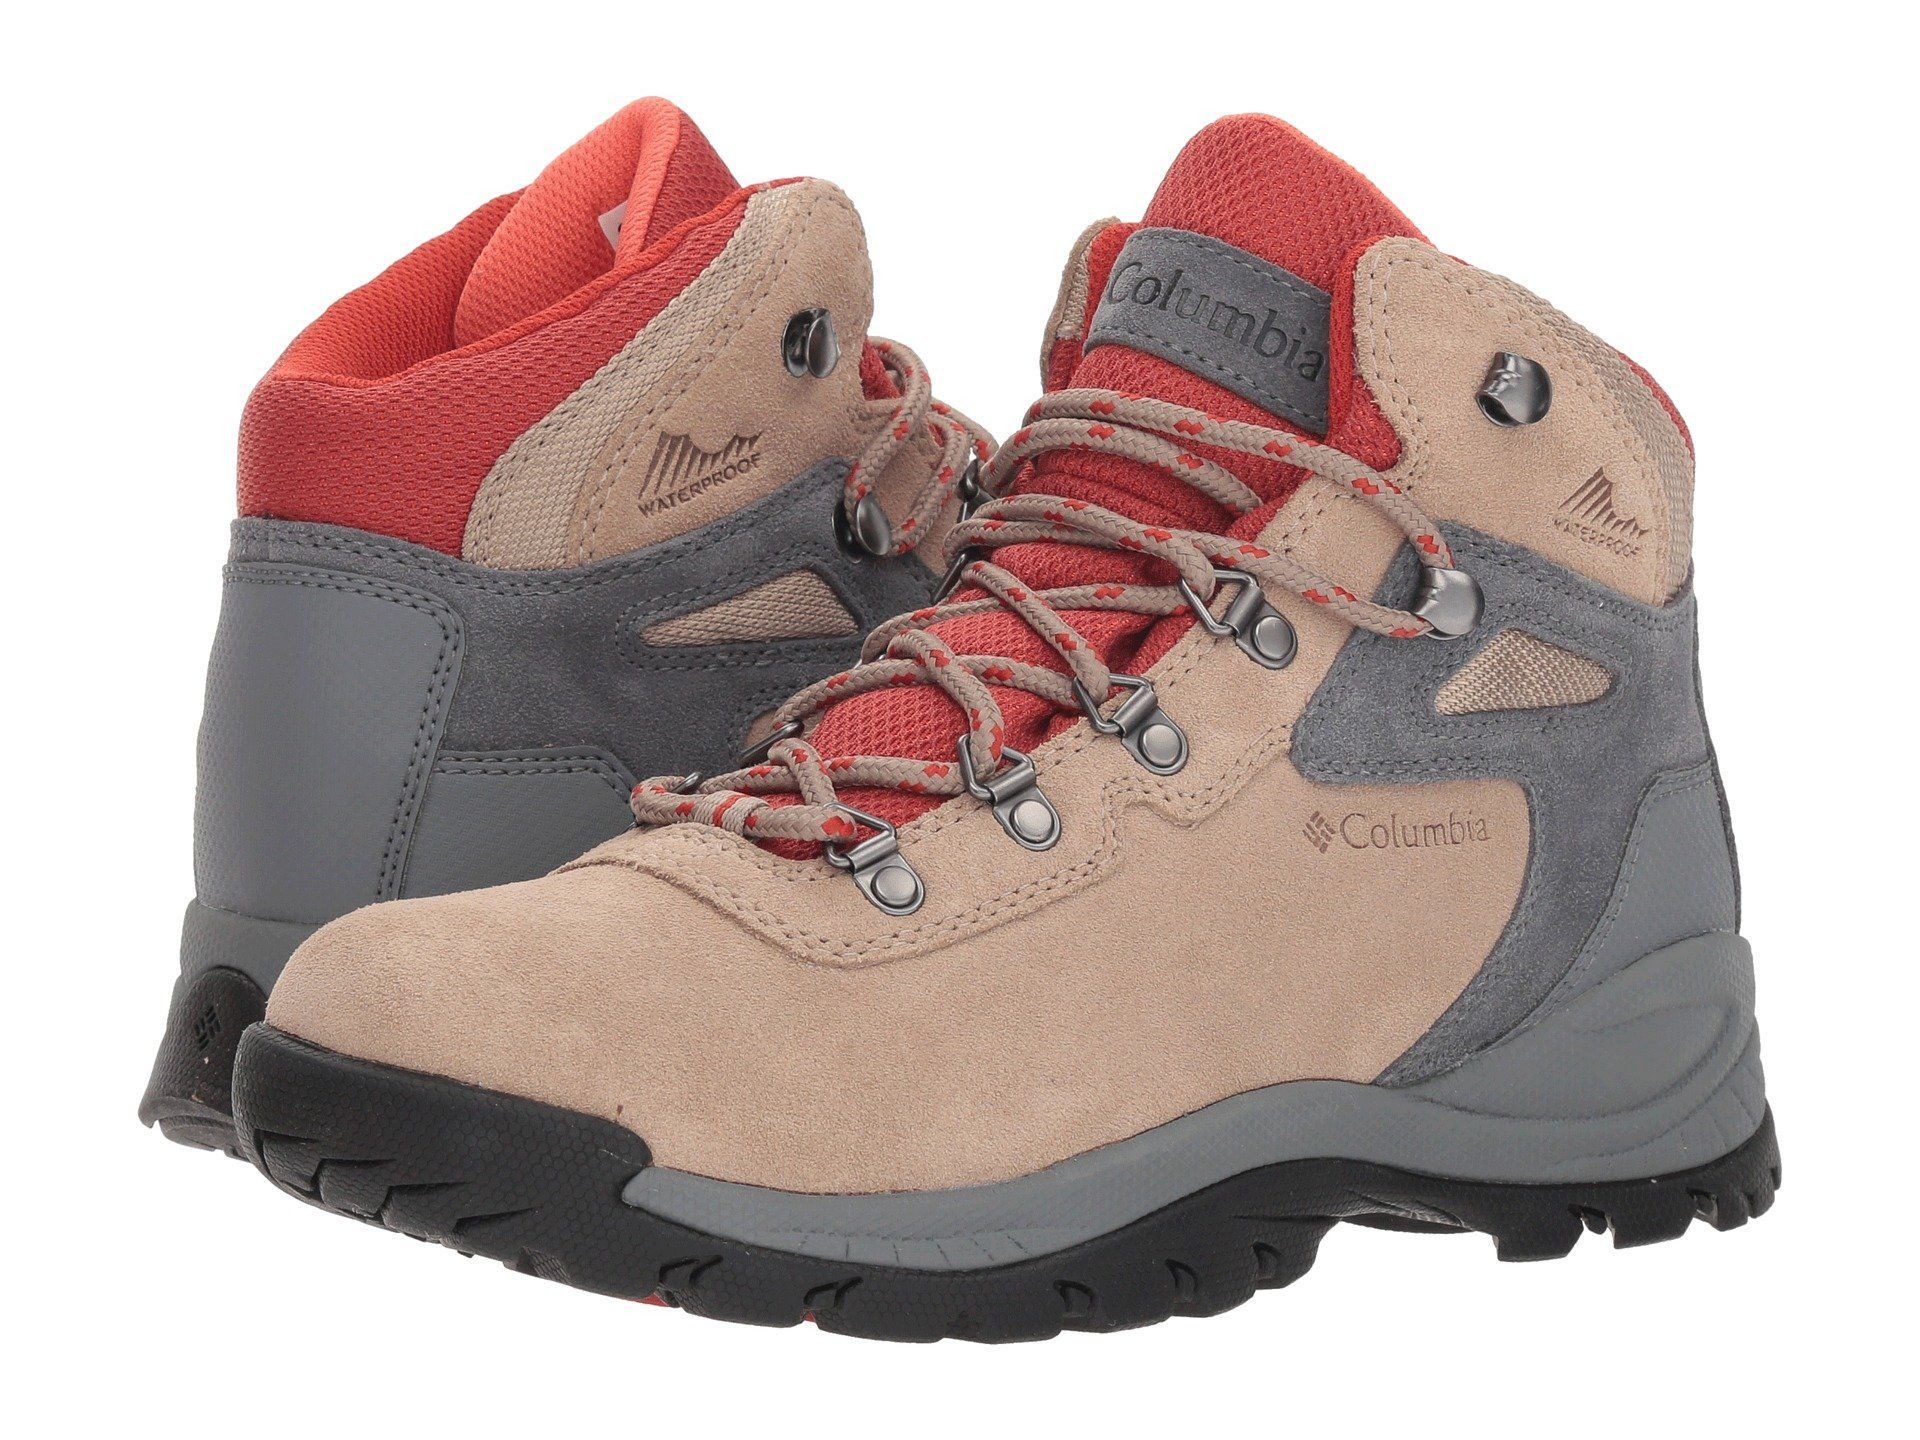 Amped Columbia Ridge Womens Hiking Plus Newton Waterproof b7ygvYf6